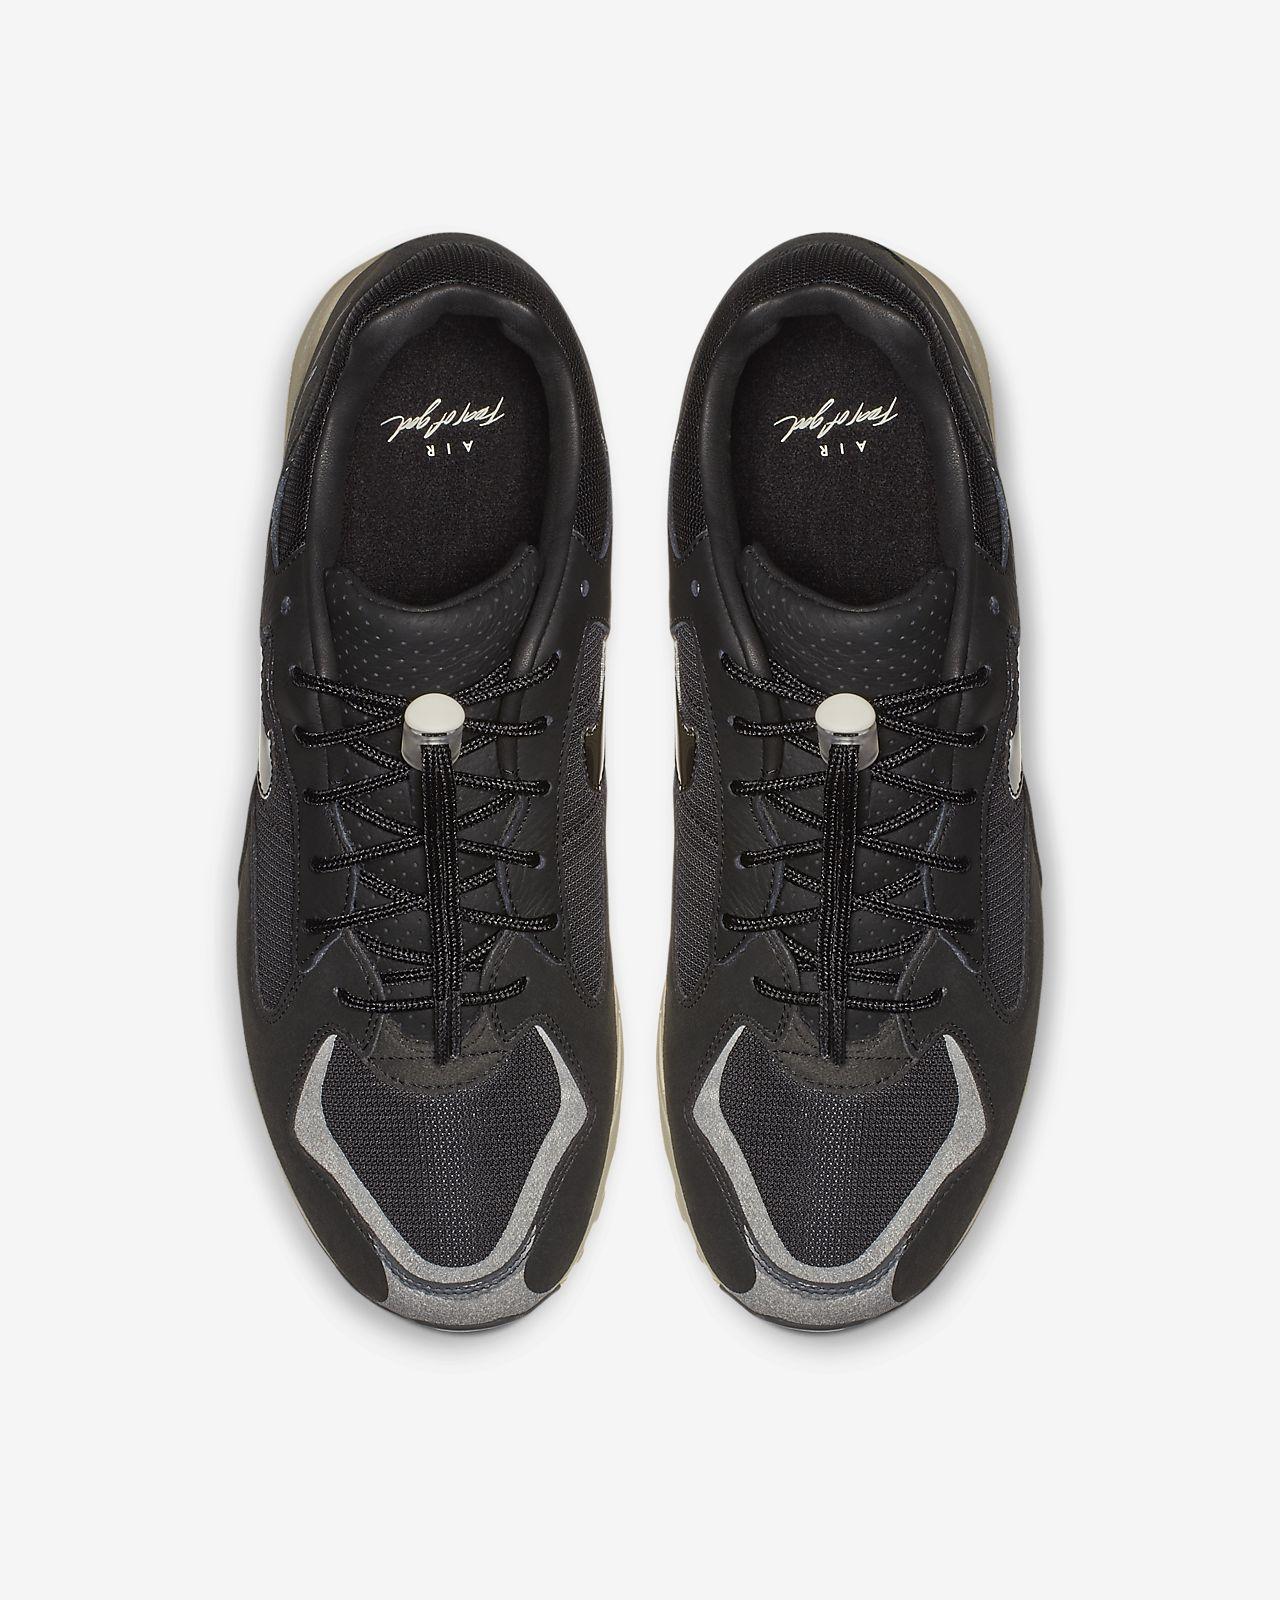 0445ffcb33017 Nike Air Skylon II x Fear of God Men's Shoe. Nike.com IN